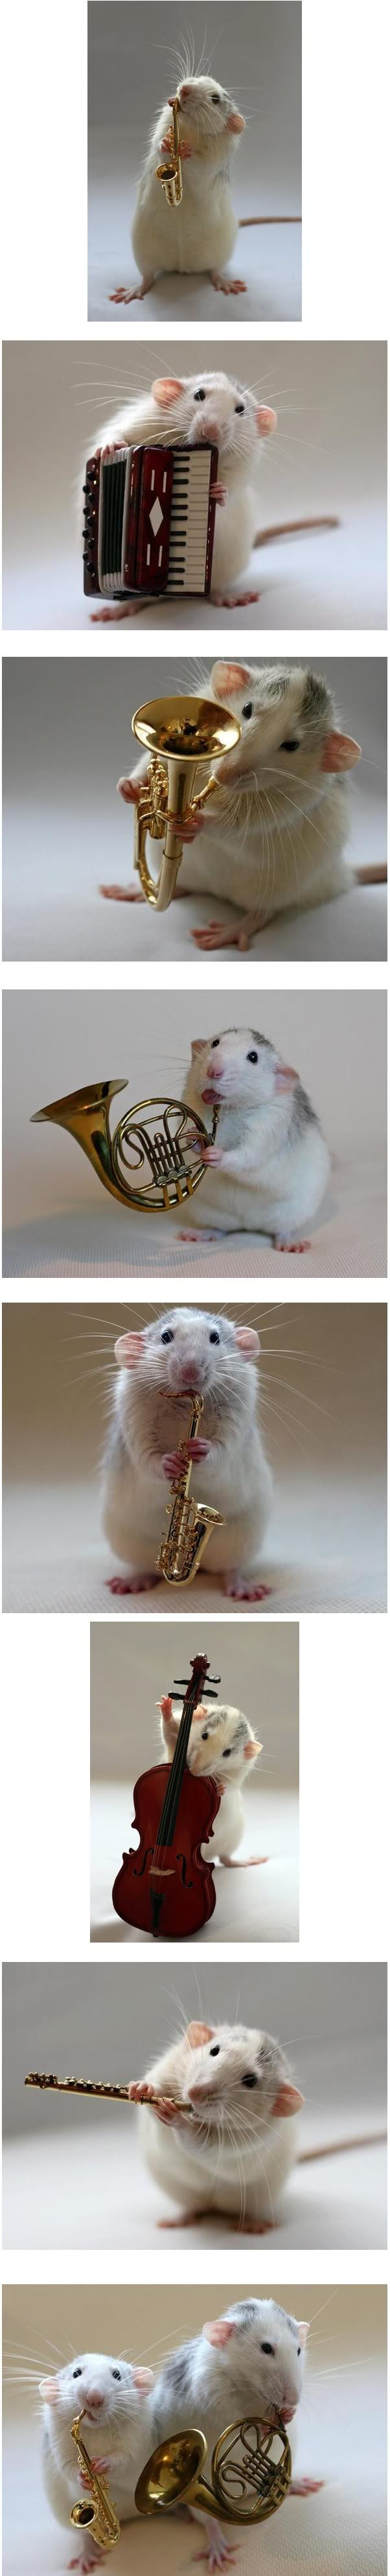 rat orchestra